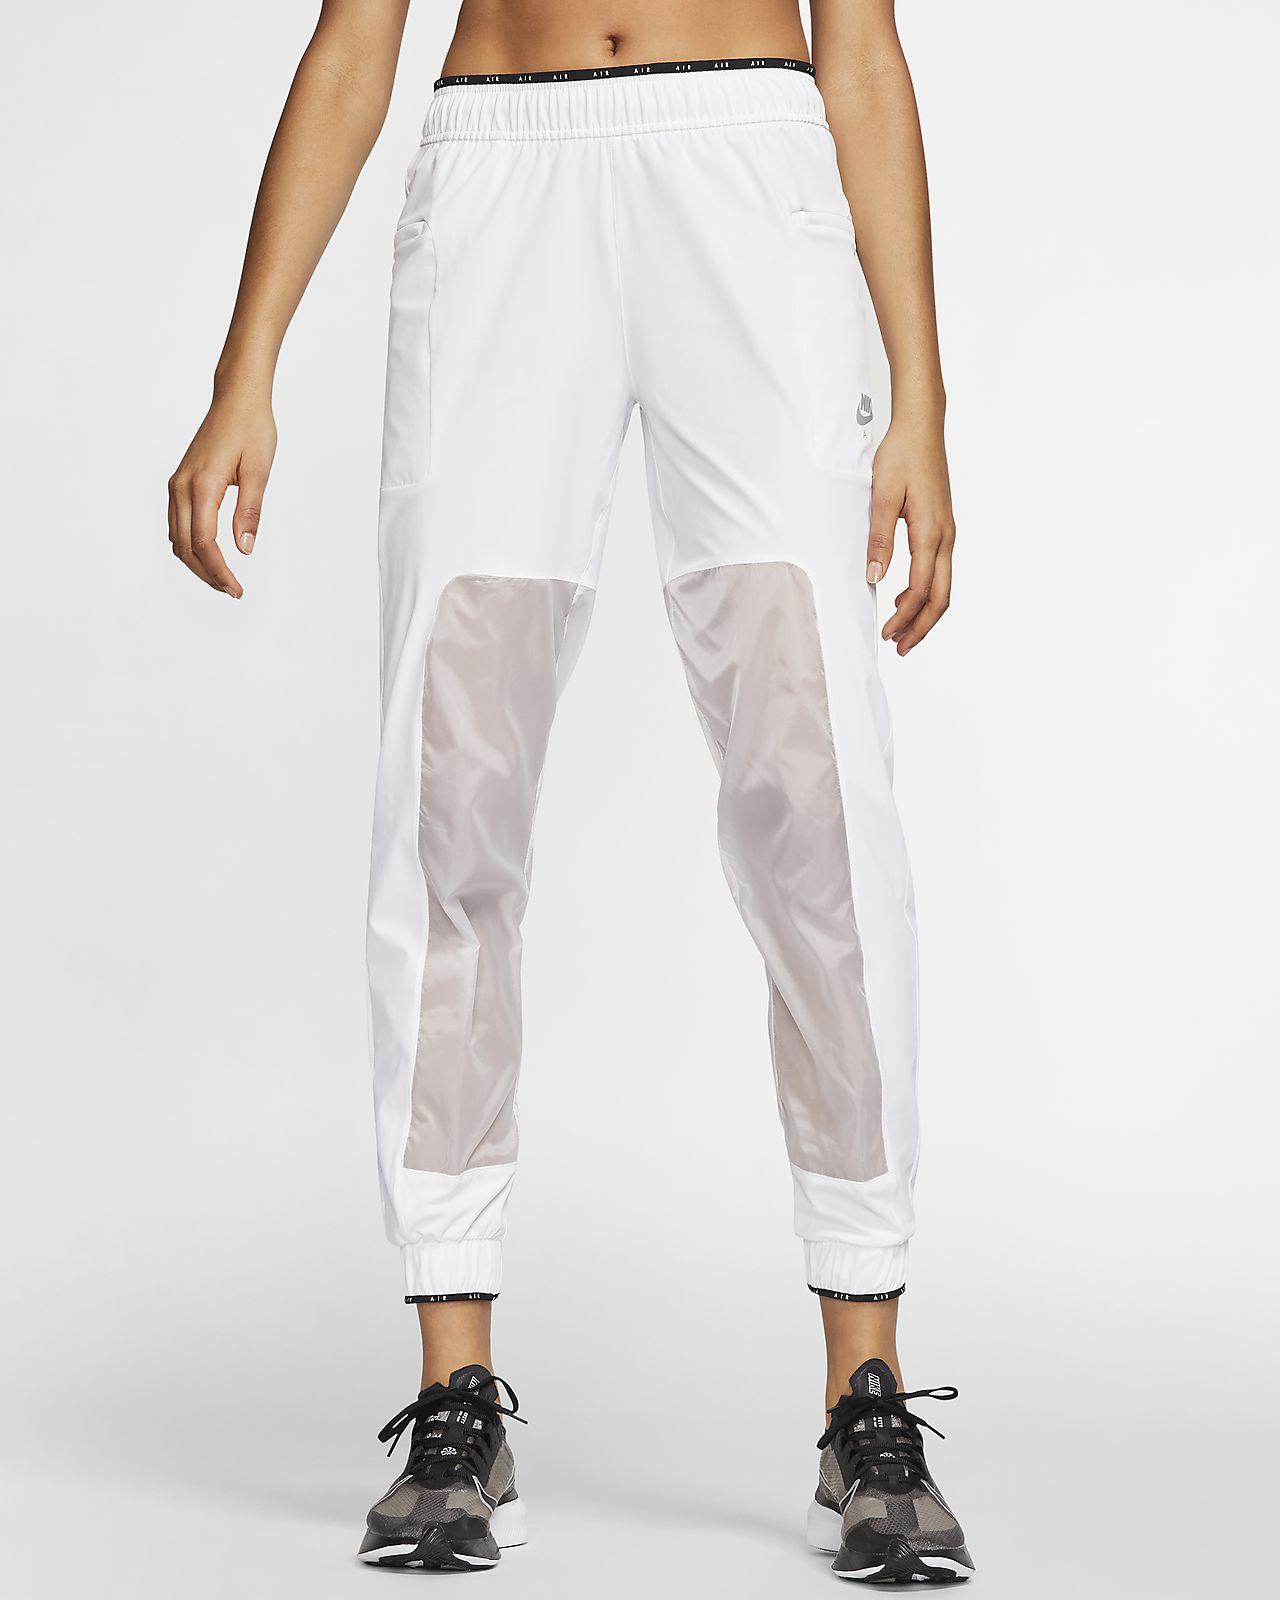 Nike Air Women's Running Pants